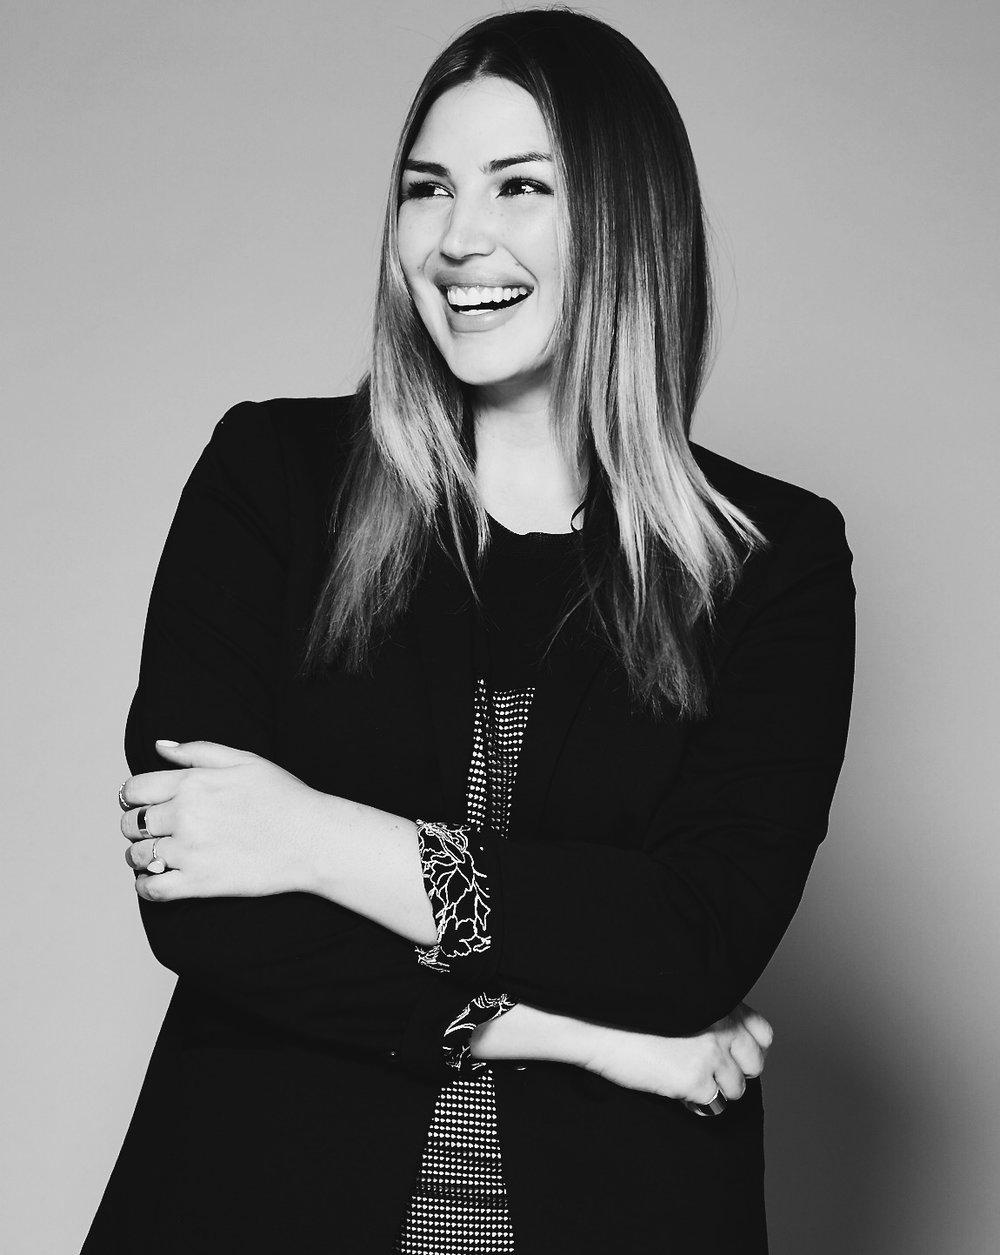 Katie Willcox